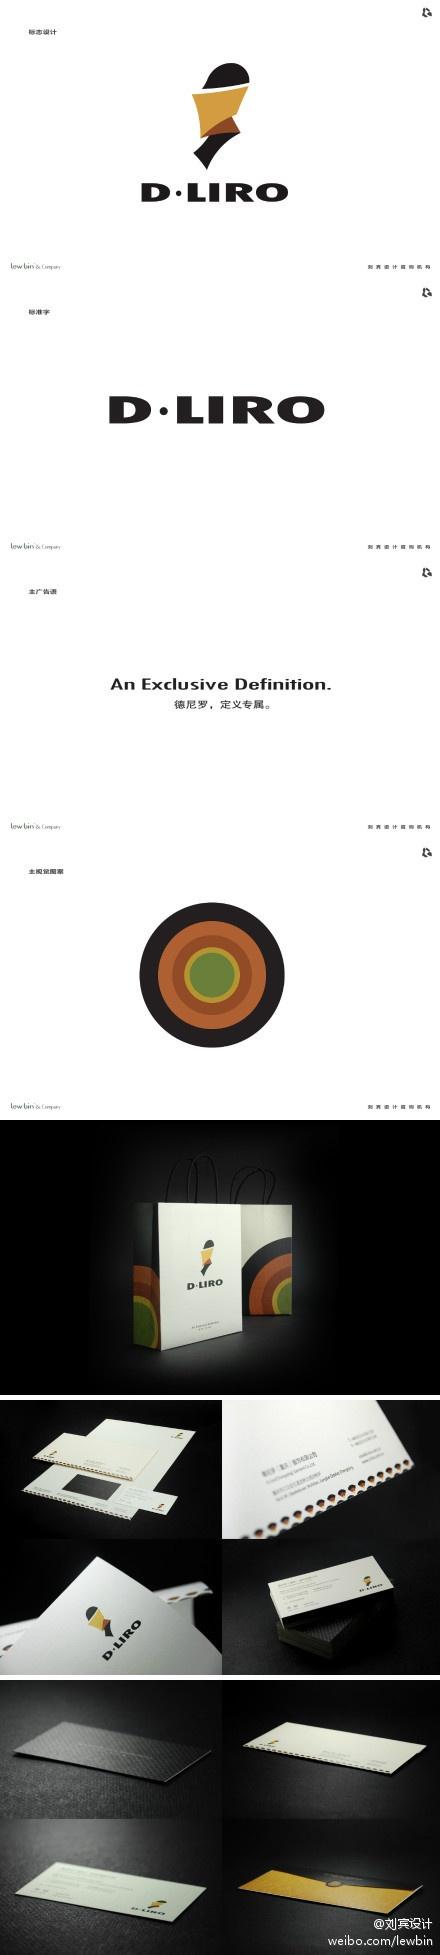 Olympic rings logo rio 2016 olympics logo designed by fred gelli -